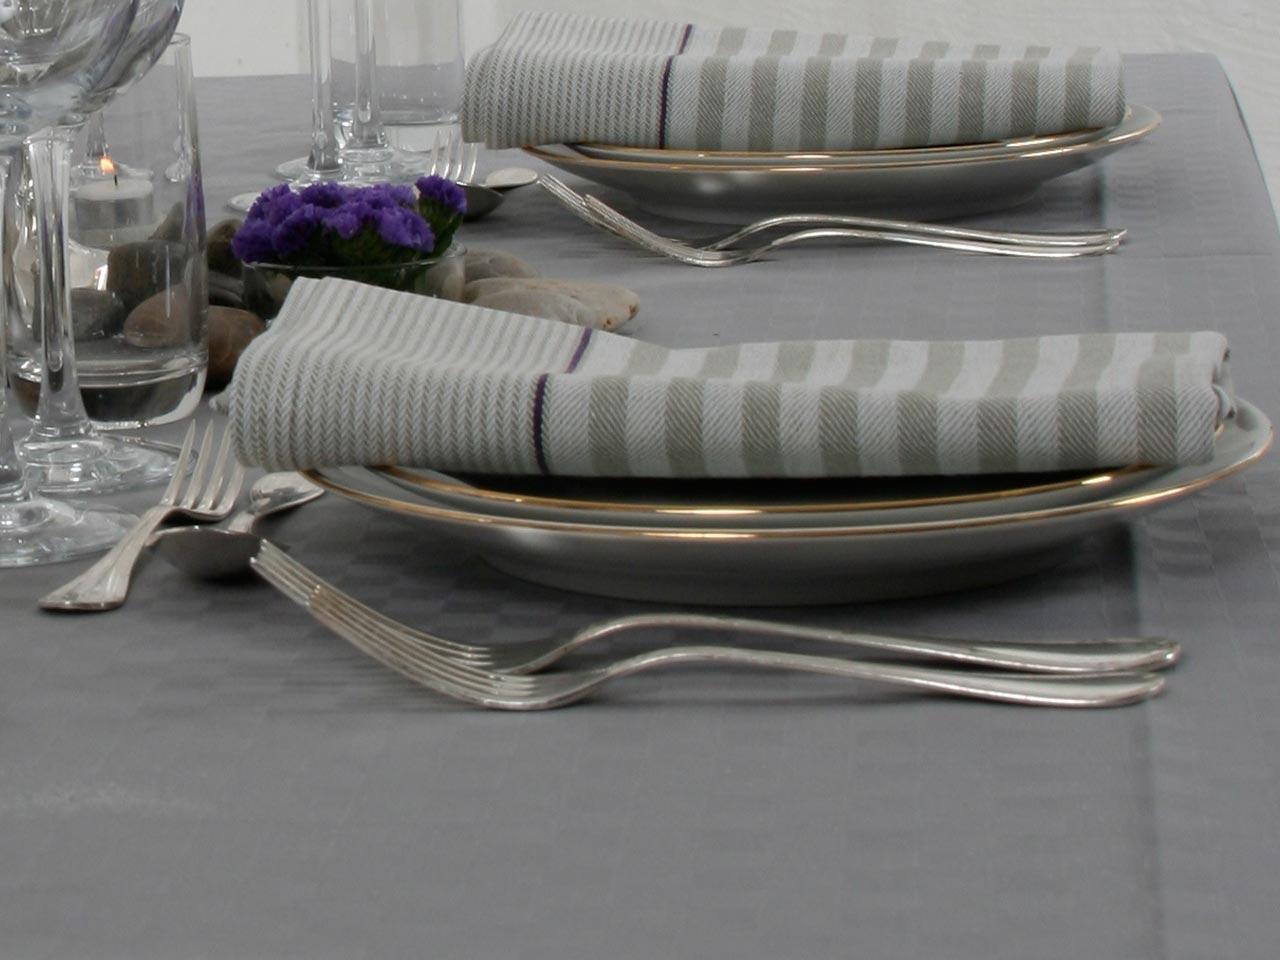 nyanser av grått vibrator